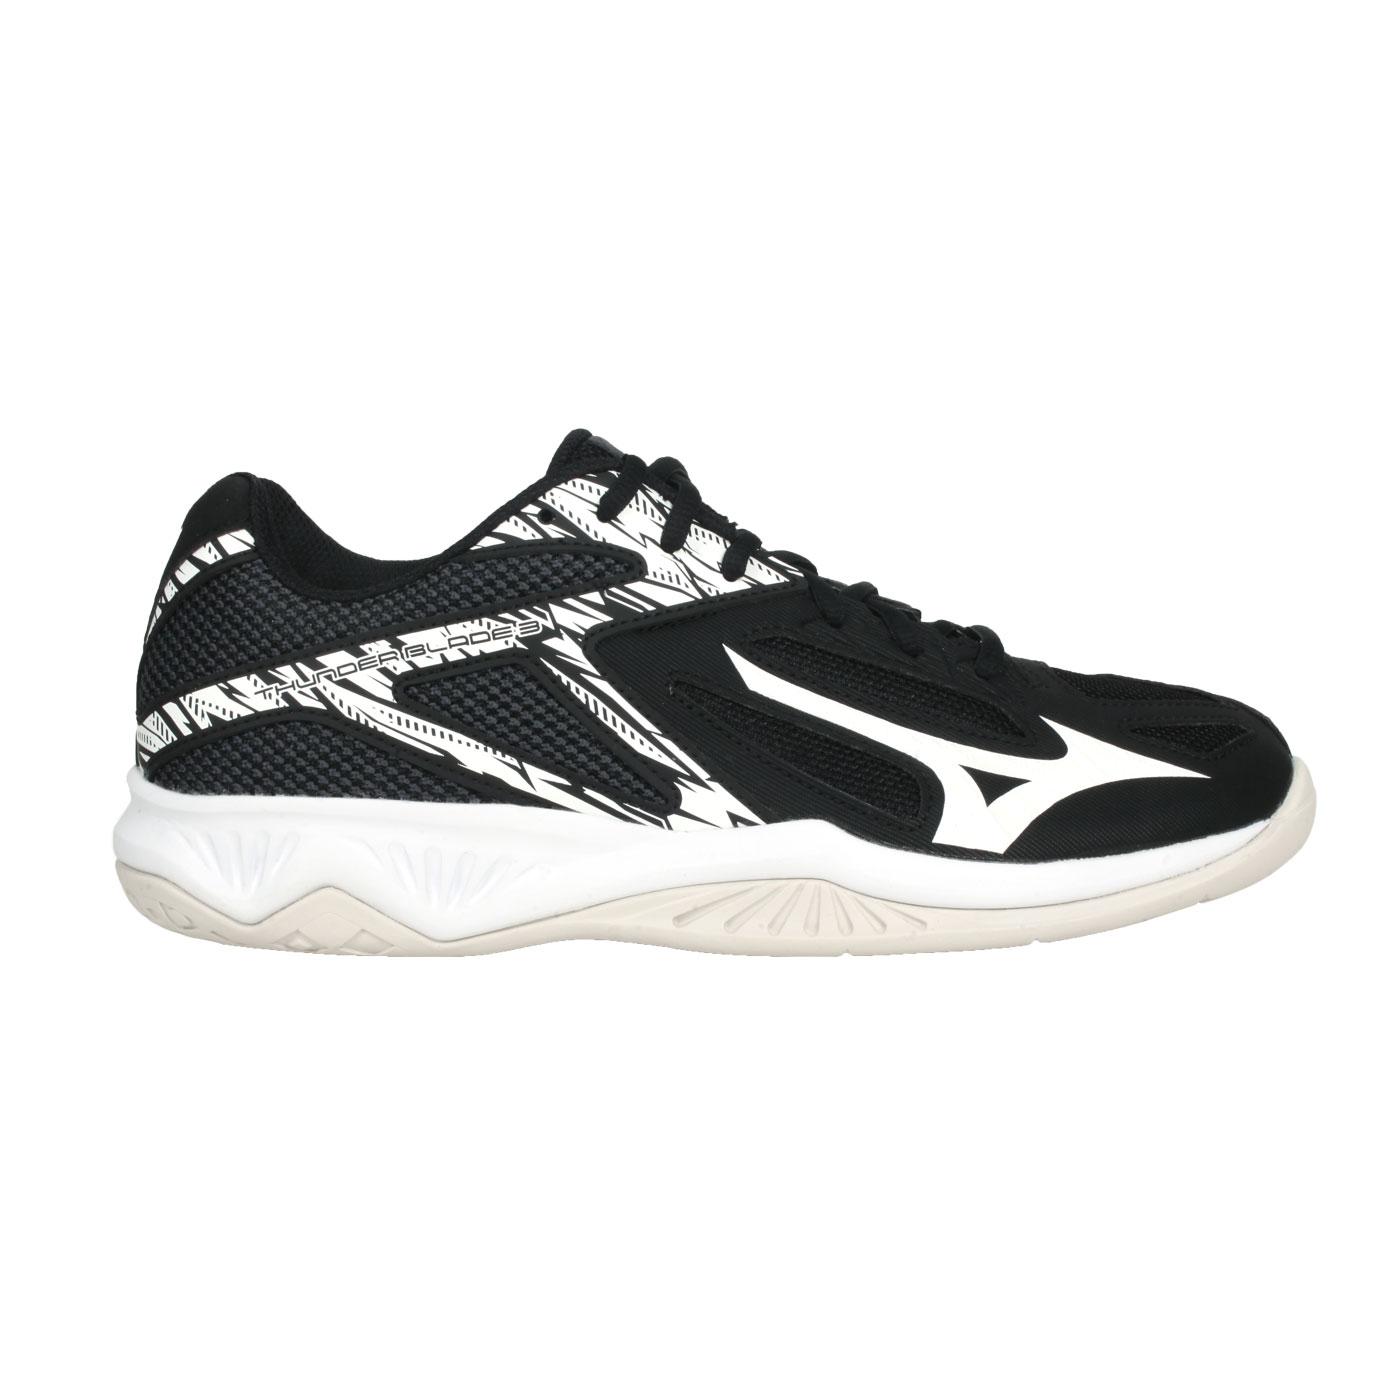 MIZUNO 排球鞋  @THUNDER BLADE 3@V1GA217002